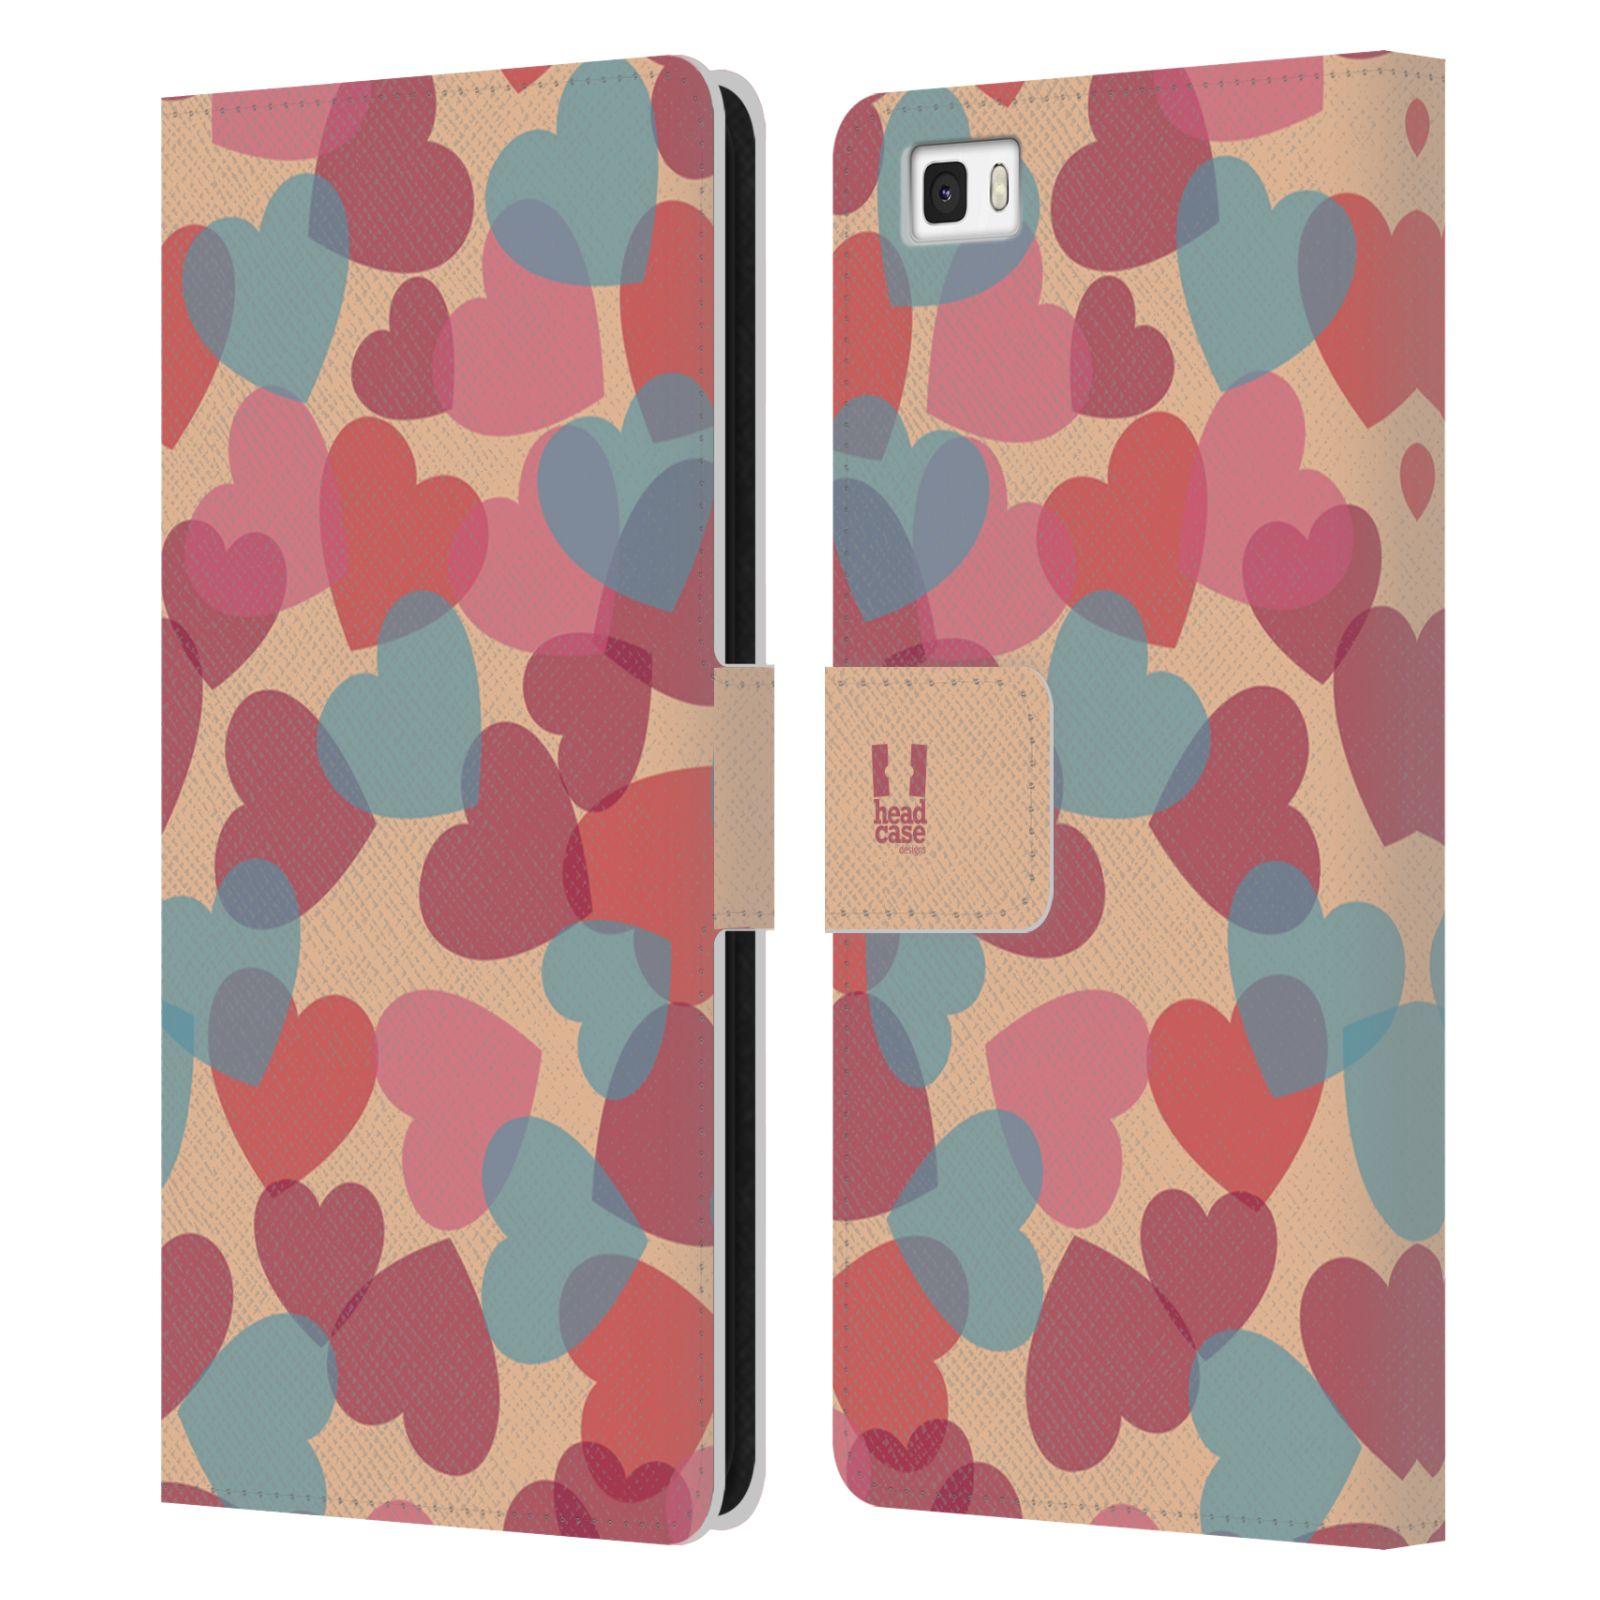 HEAD CASE Flipové pouzdro pro mobil Huawei P8 LITE vzor prolínající se srdíčka, srdce, láska, růžová